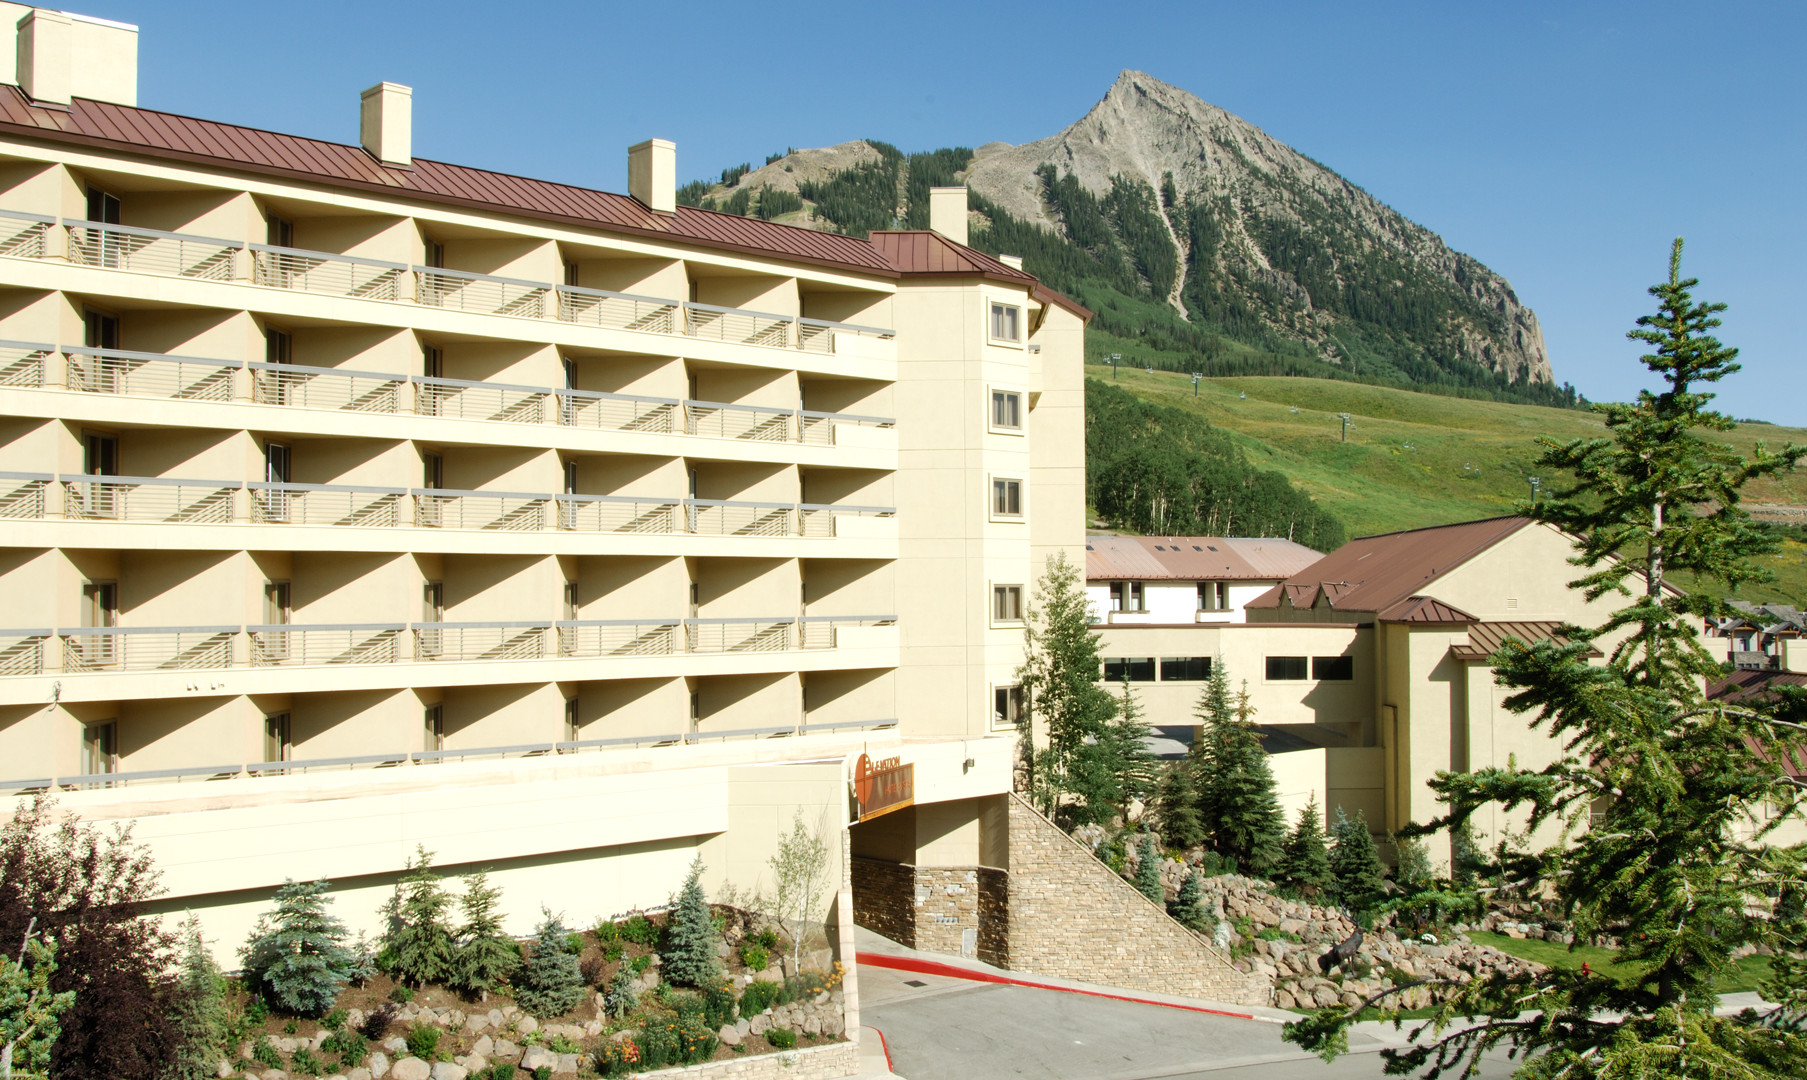 TS_elevation hotel_10.jpg